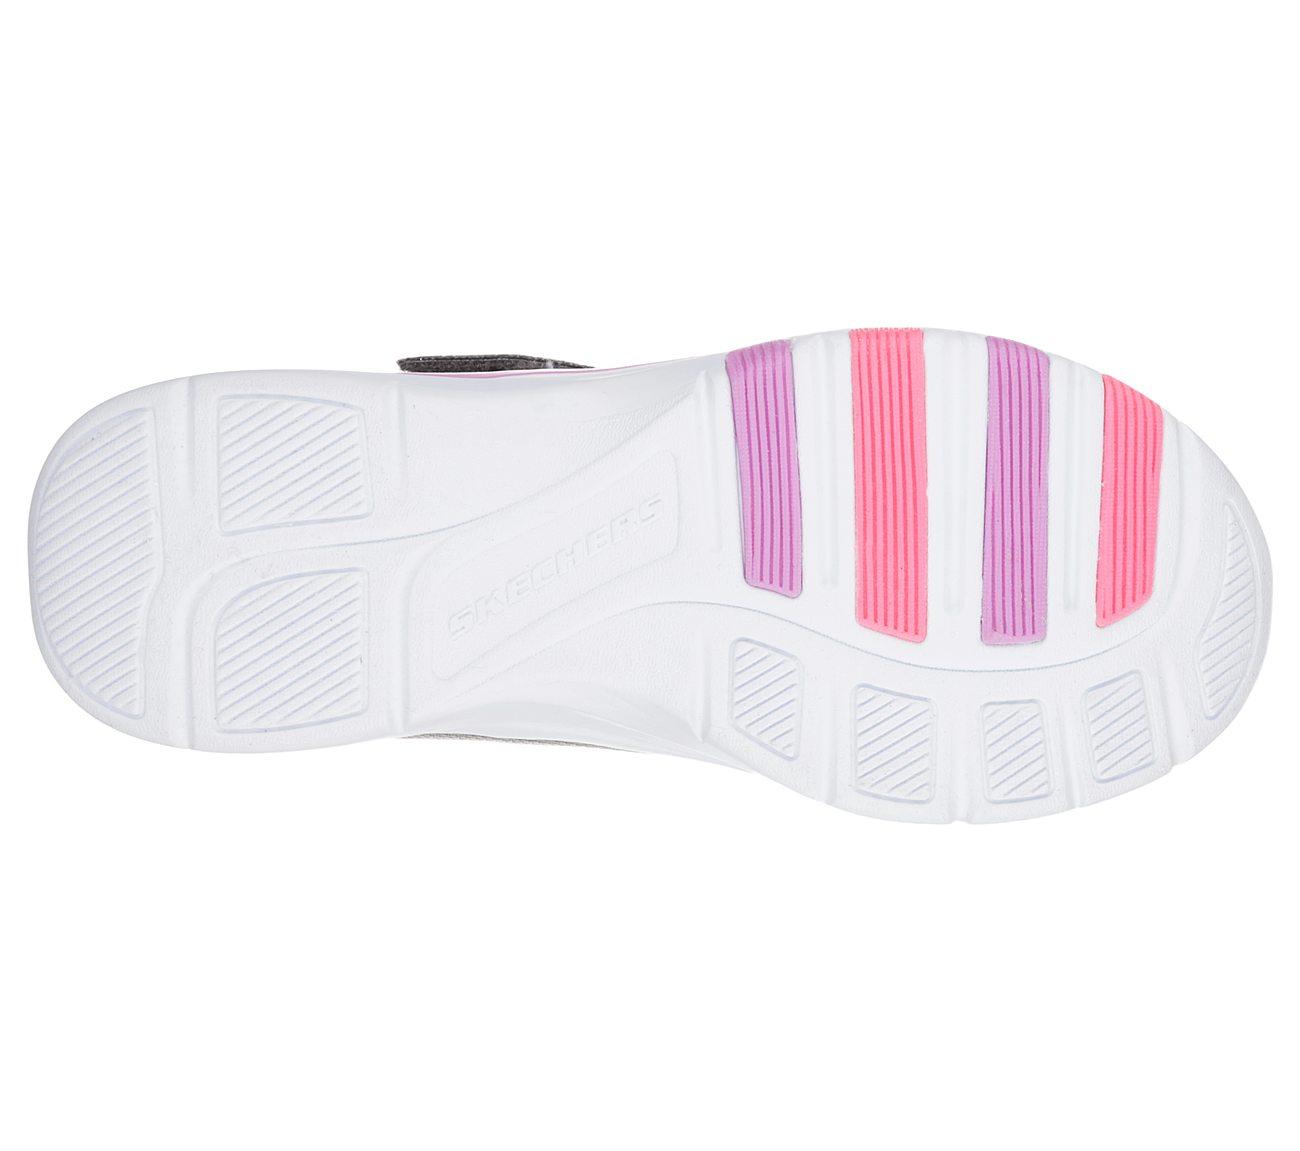 caf88b783c52 Buy SKECHERS Trainer Lite - Bright Racer SKECHERS Sport Shoes only ...